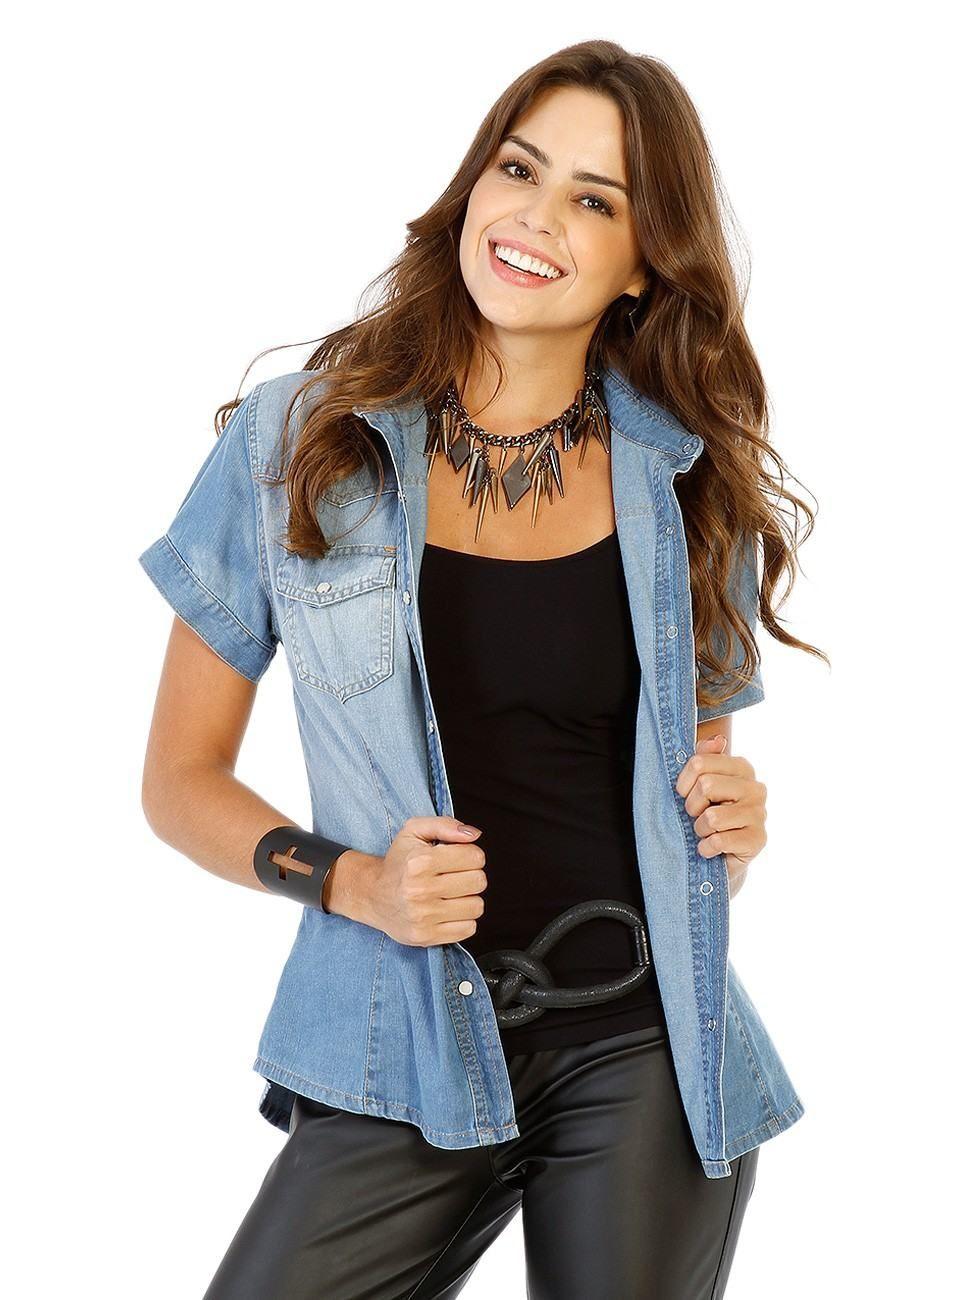 9657c0274 Resultado de imagem para looks camisa jeans manga curta feminina ...